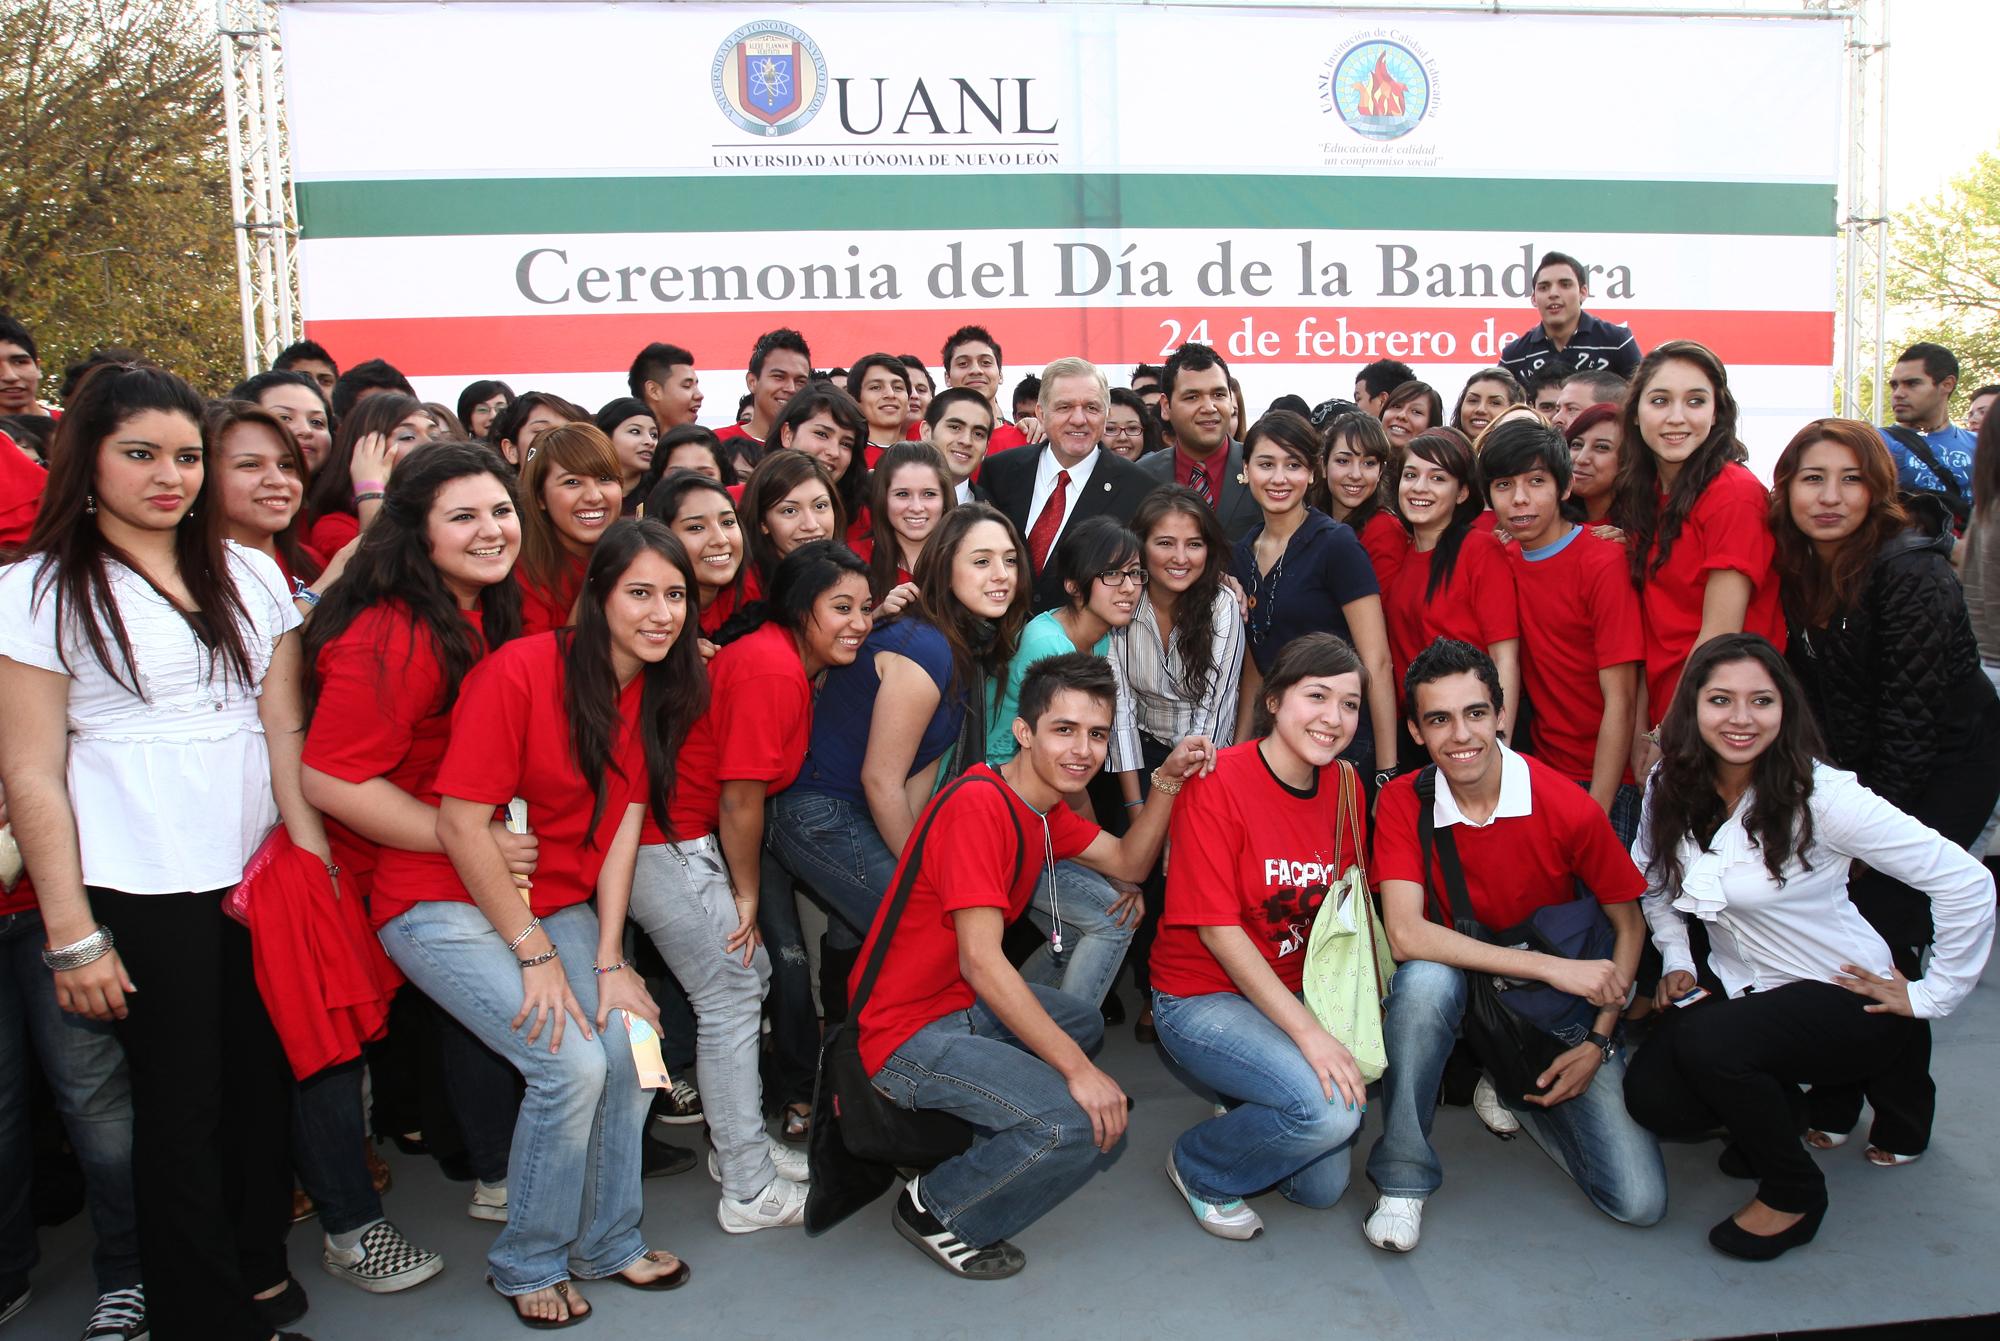 Estudiantes de la UANL